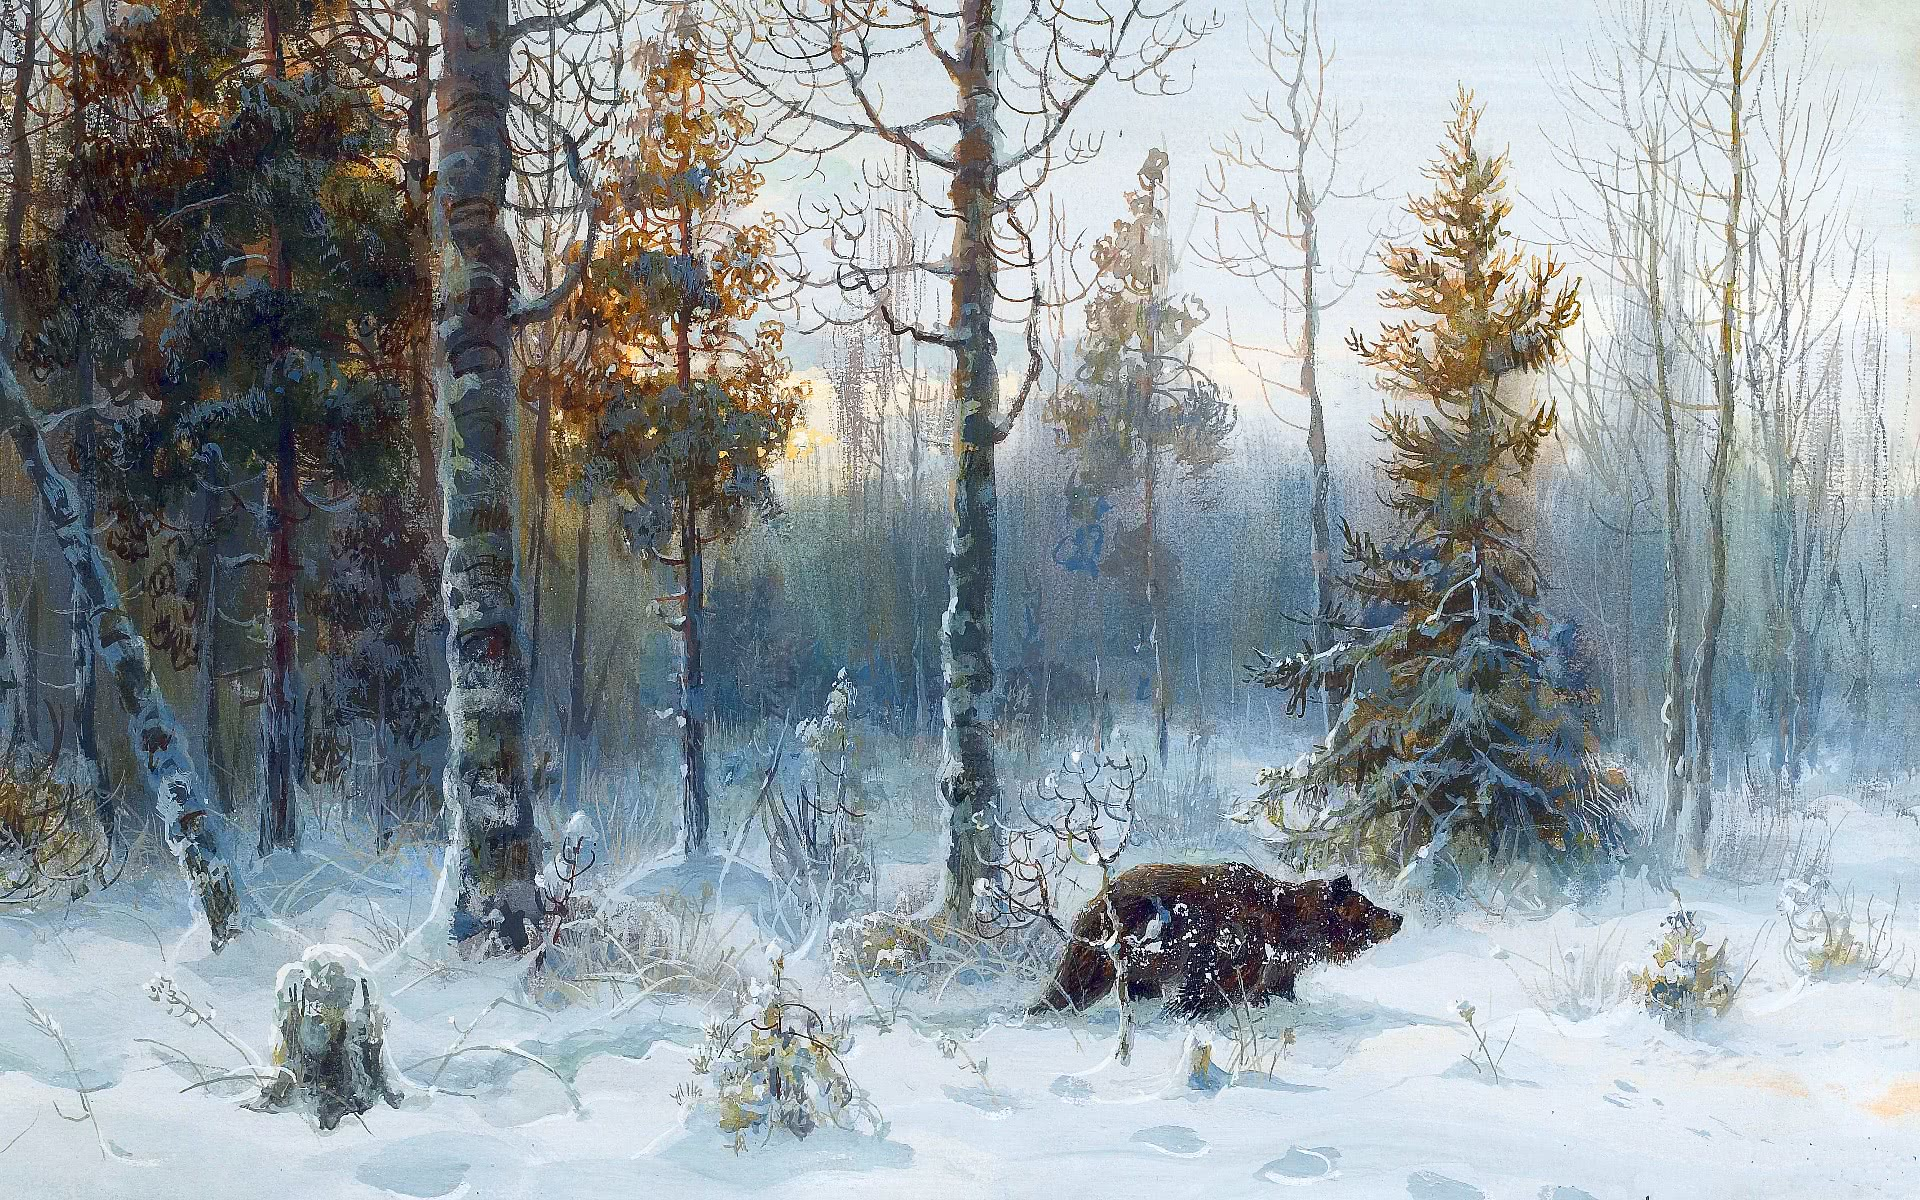 winter landscape bear scenic wallpaper winter winter. Black Bedroom Furniture Sets. Home Design Ideas